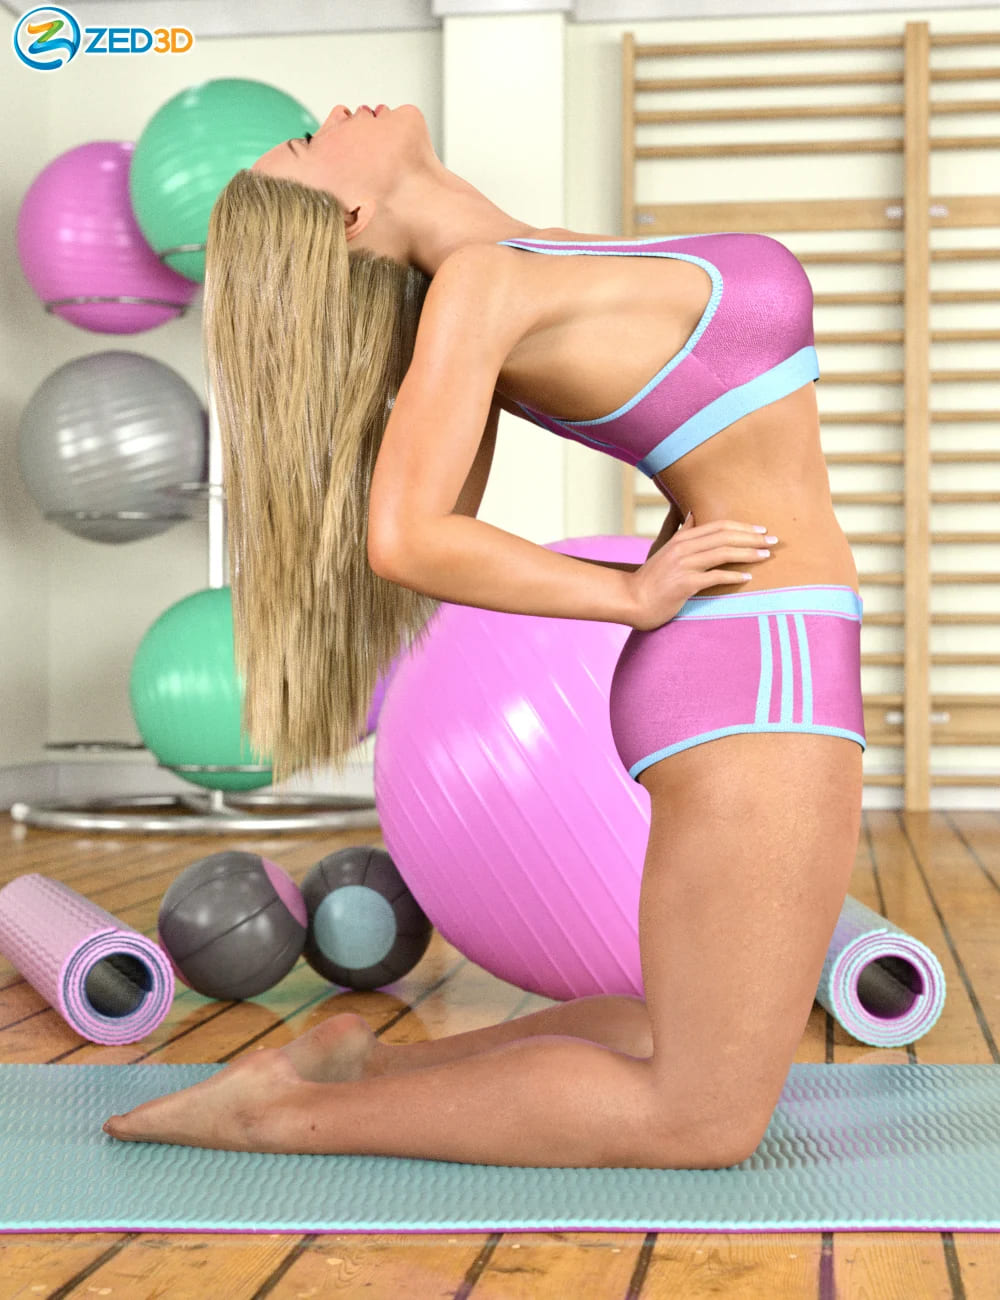 Z Exercise Studio and Poses for Genesis 8 Female_DAZ3D下载站